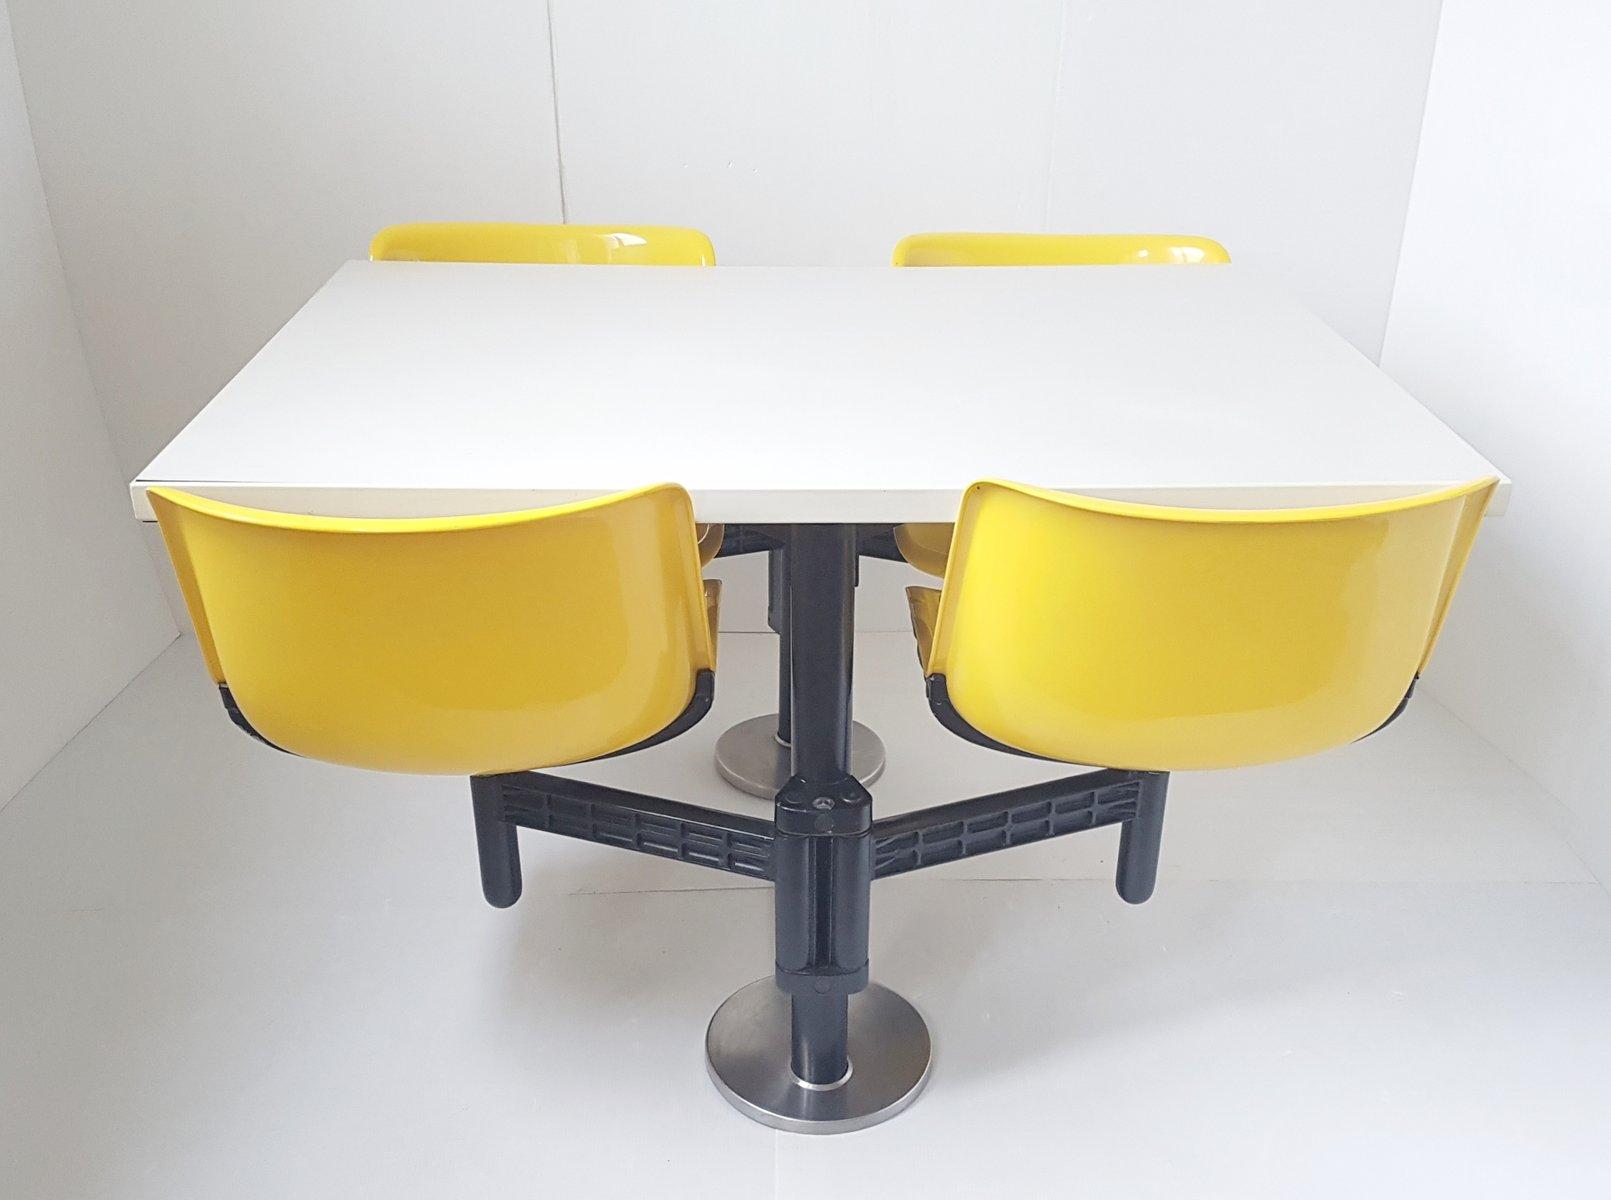 Modus Table & Chairs by Osvaldo Borsani for Tecno 1972 for sale